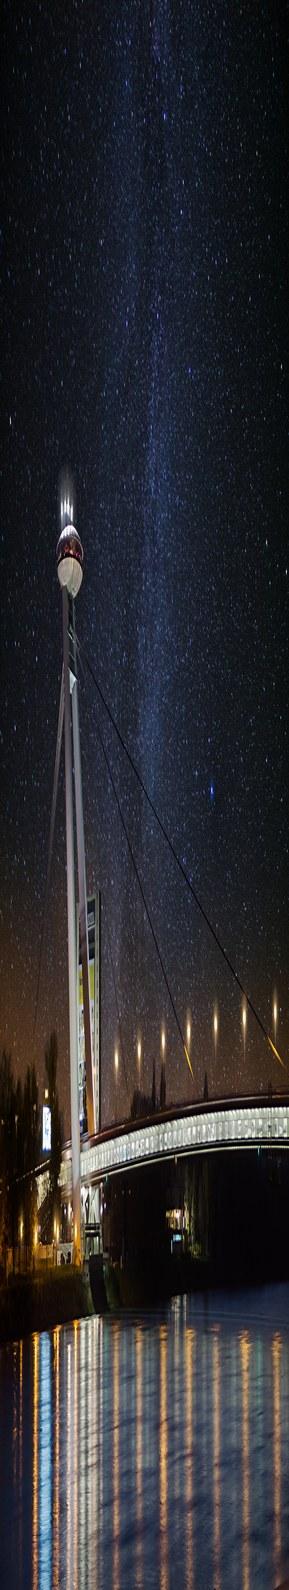 stock-photo-snp-bridge-at-night-77922779